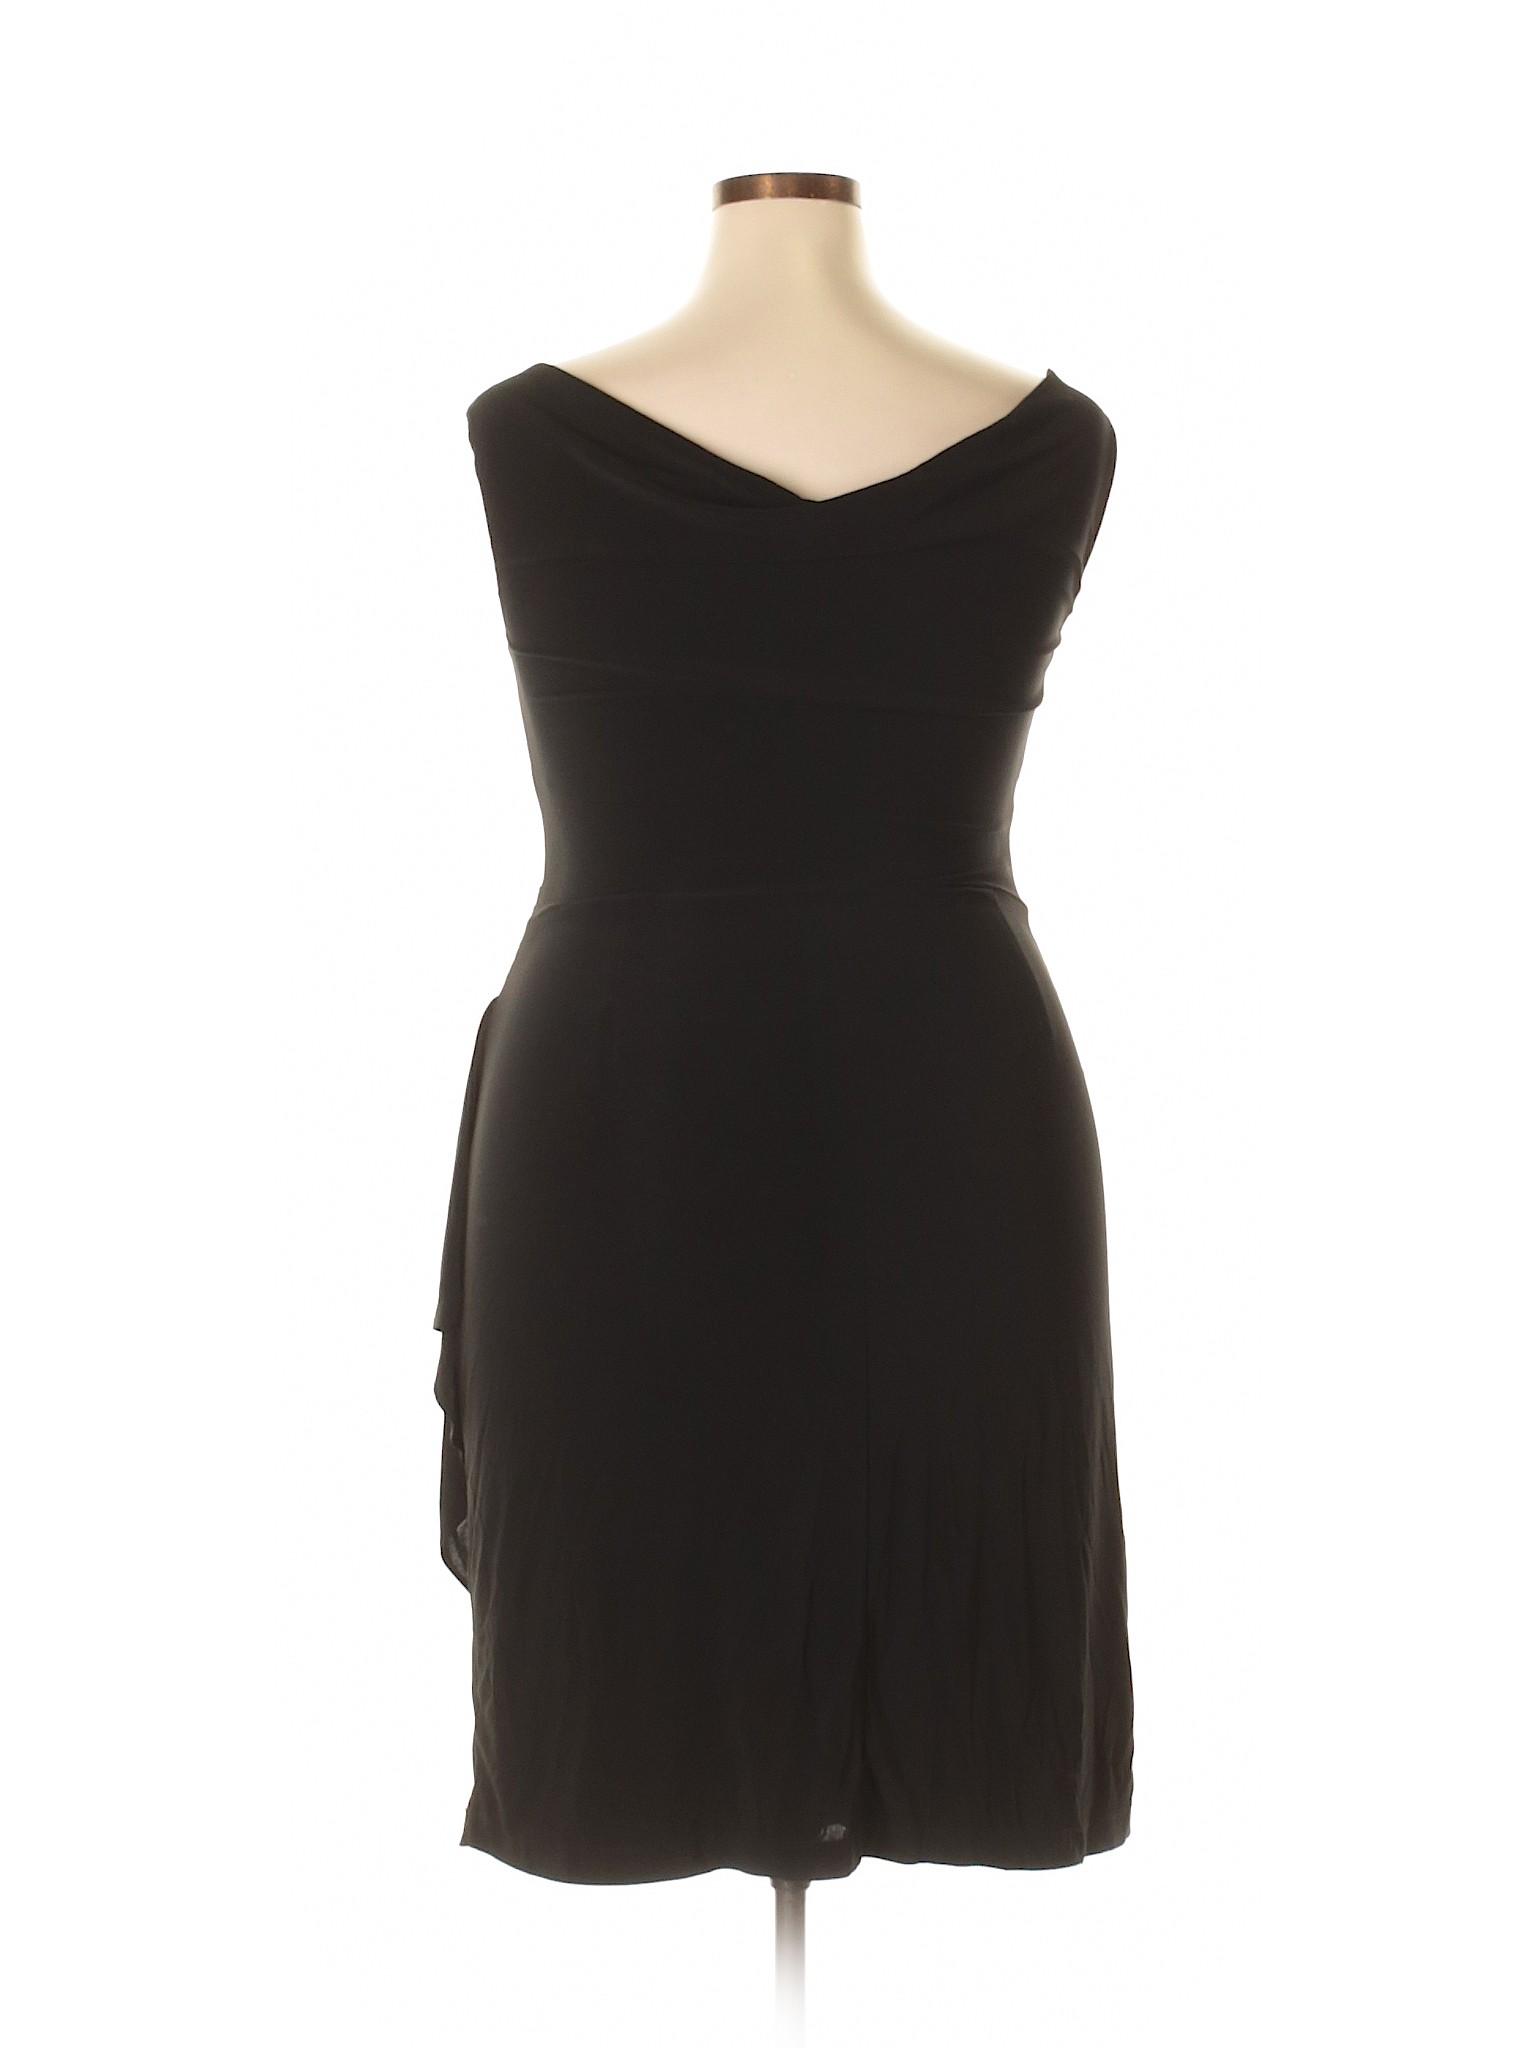 White Market Casual House winter Boutique Dress Black Rq1H7Tw